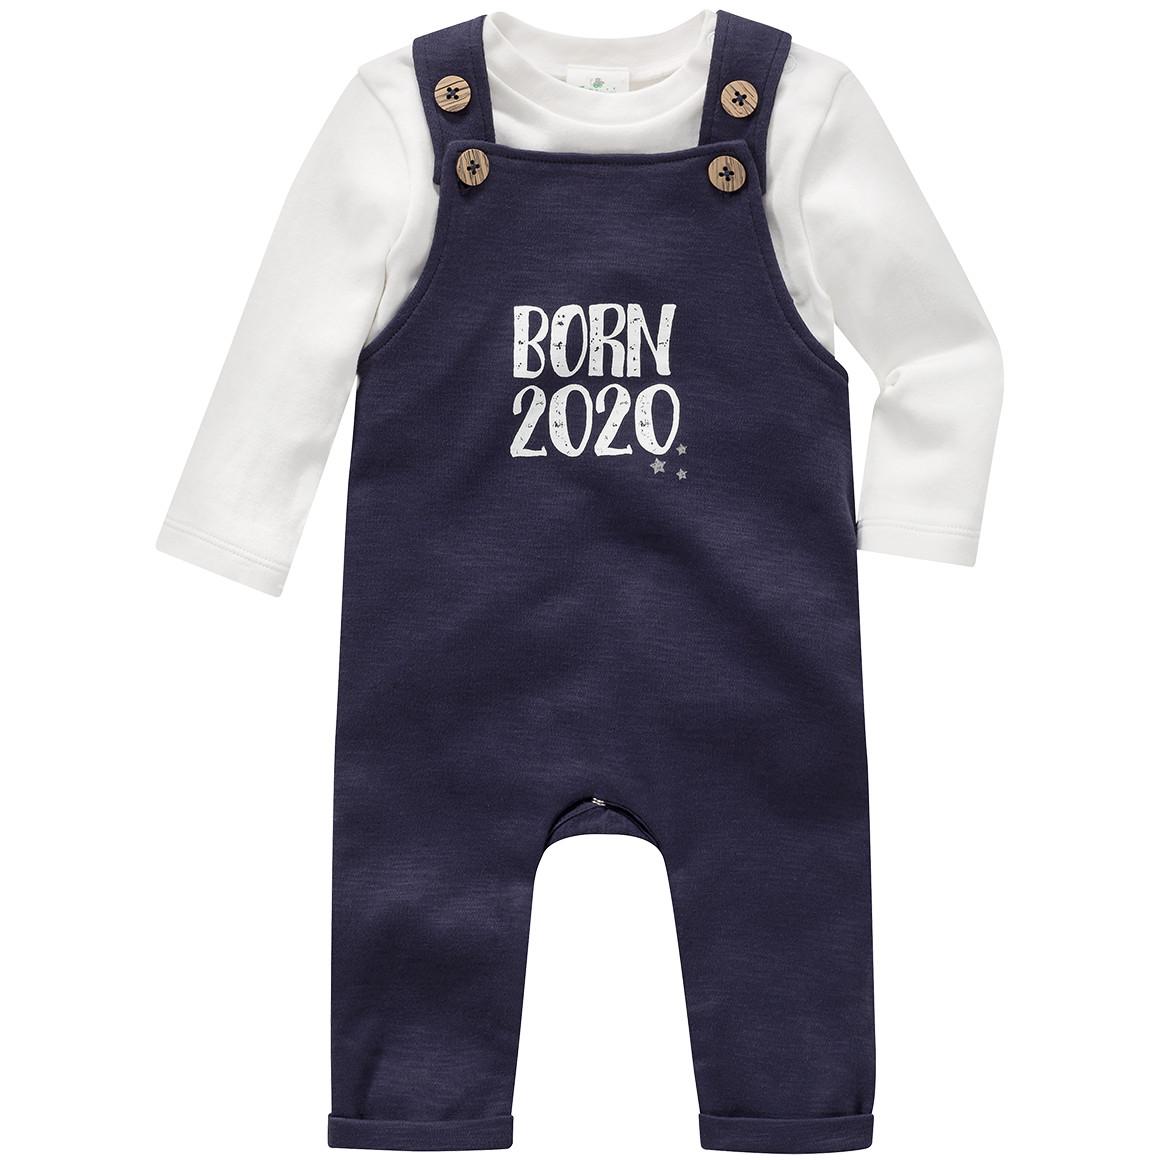 Babystrampler - Newborn Strampler und Langarmshirt Born 2020 - Onlineshop Ernstings family